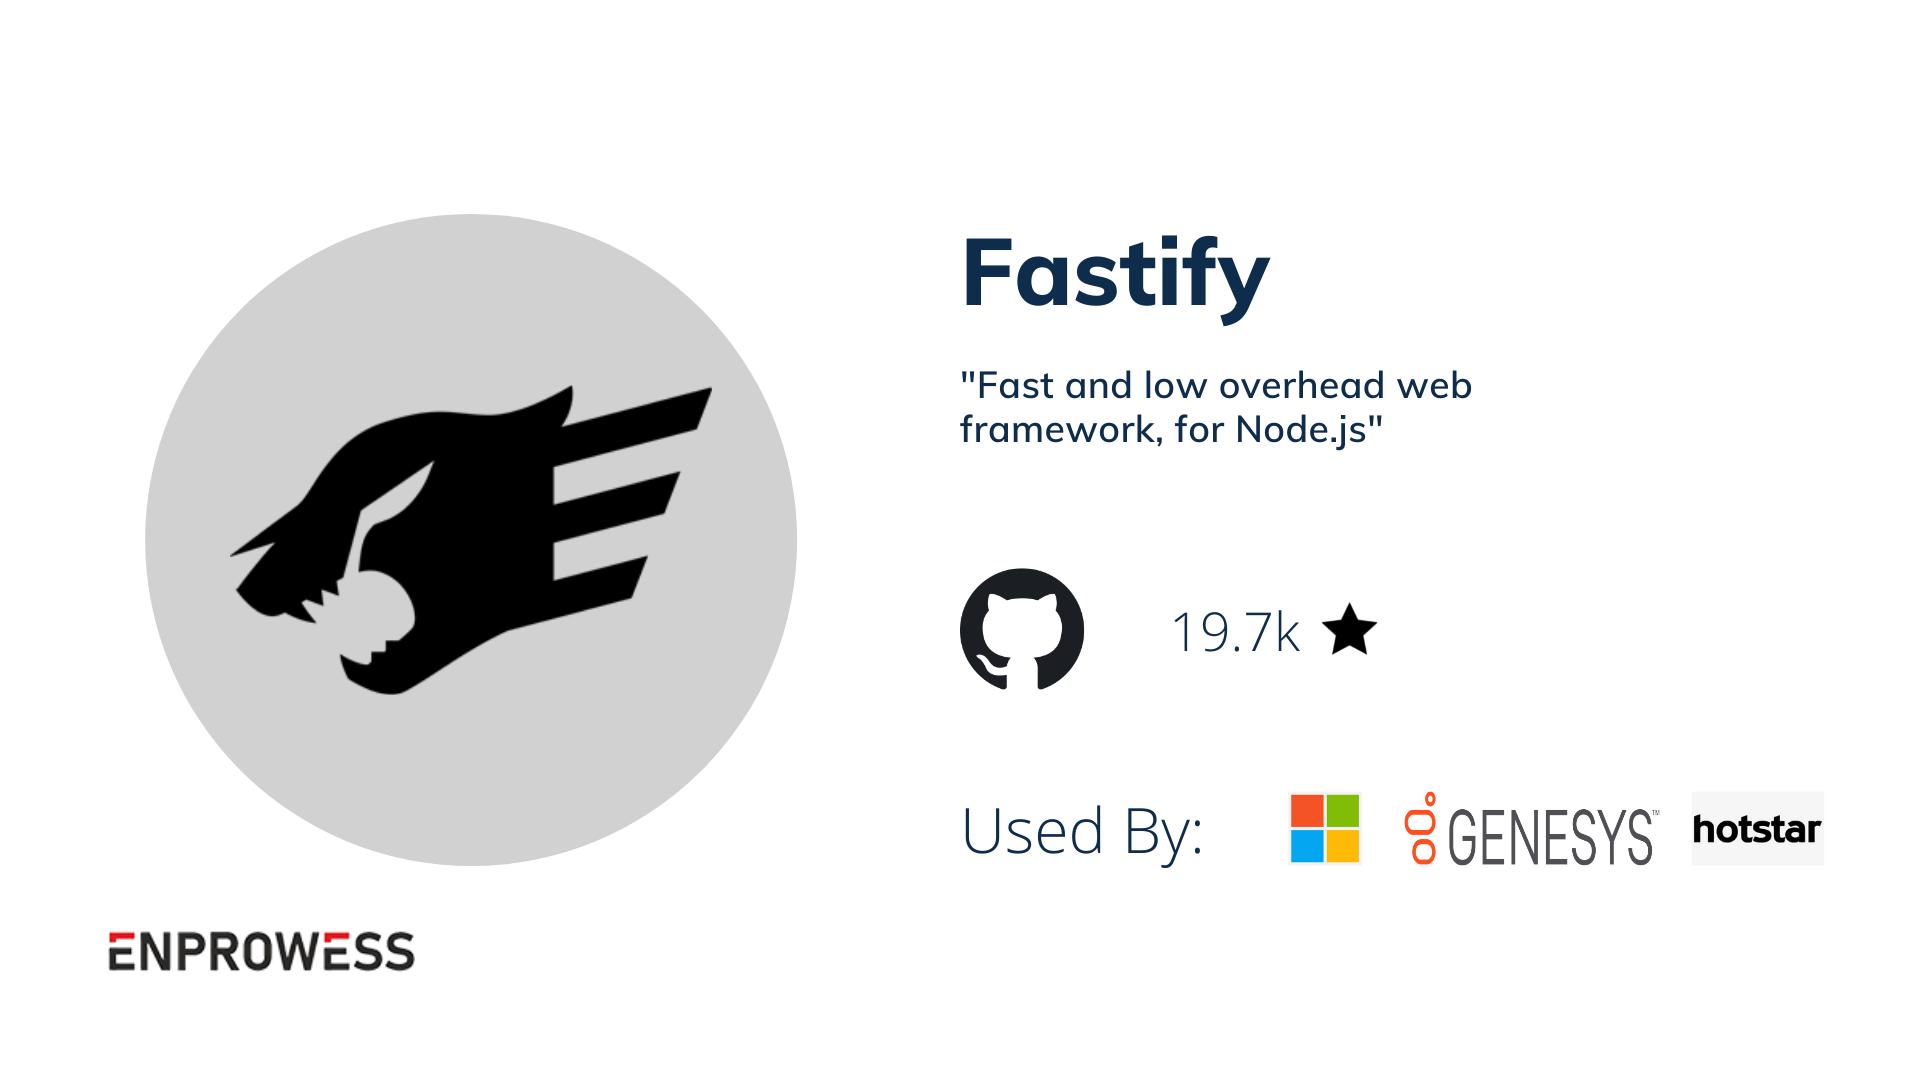 Fastify Details